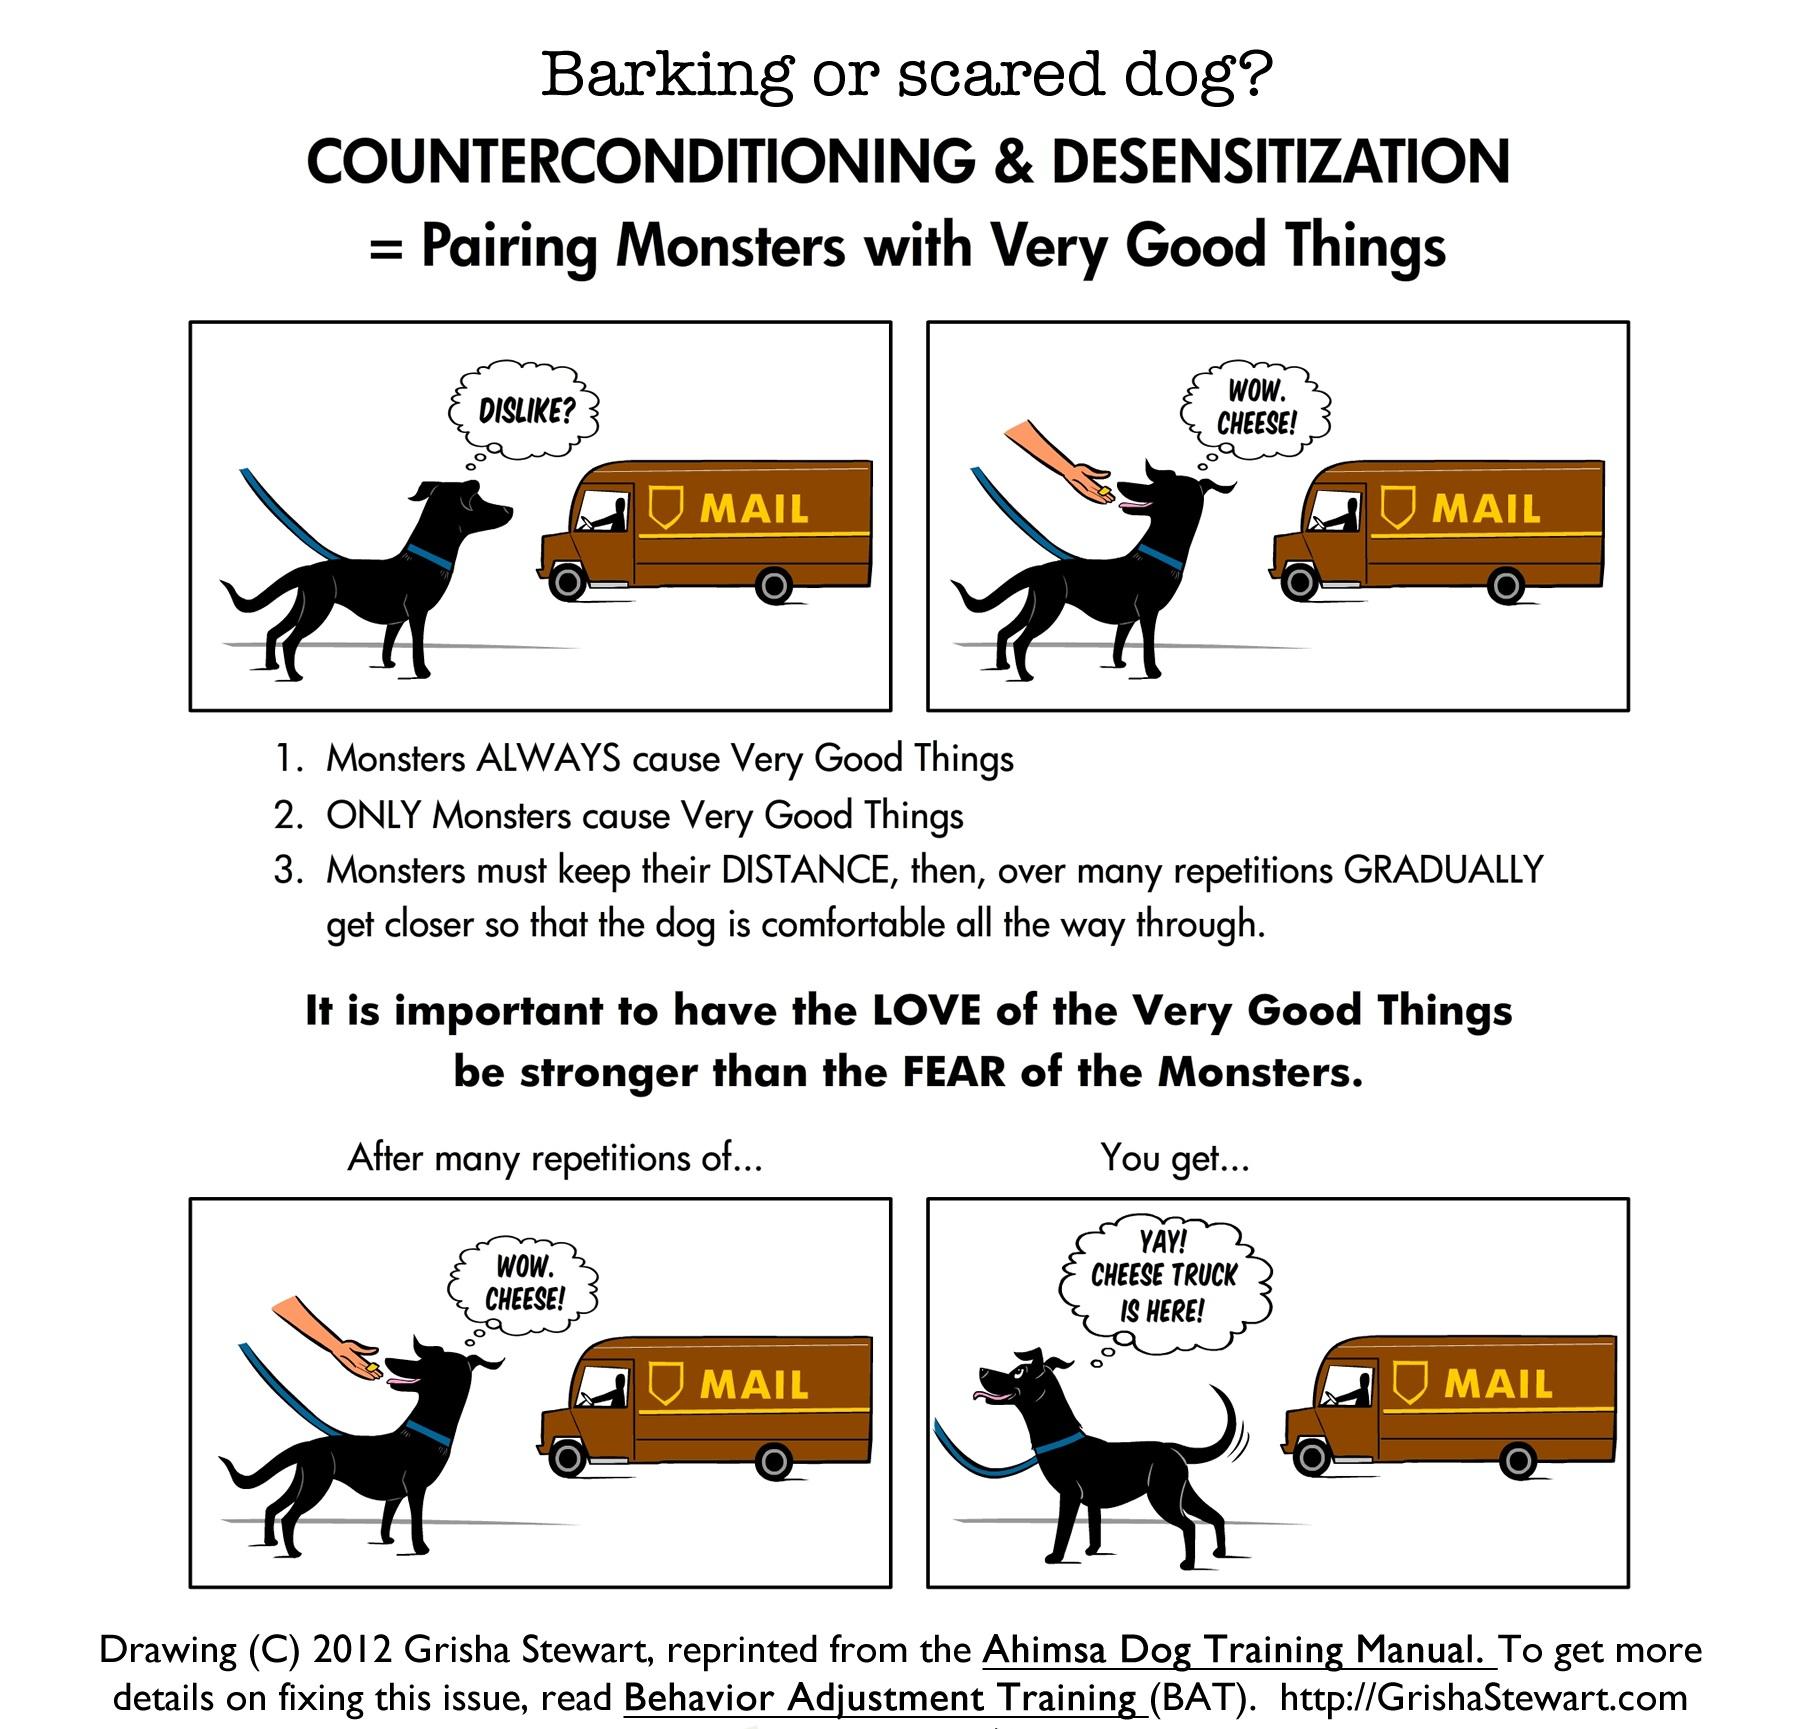 Cheese+Truck+-+counterconditioning-ahimsa-manual.jpg